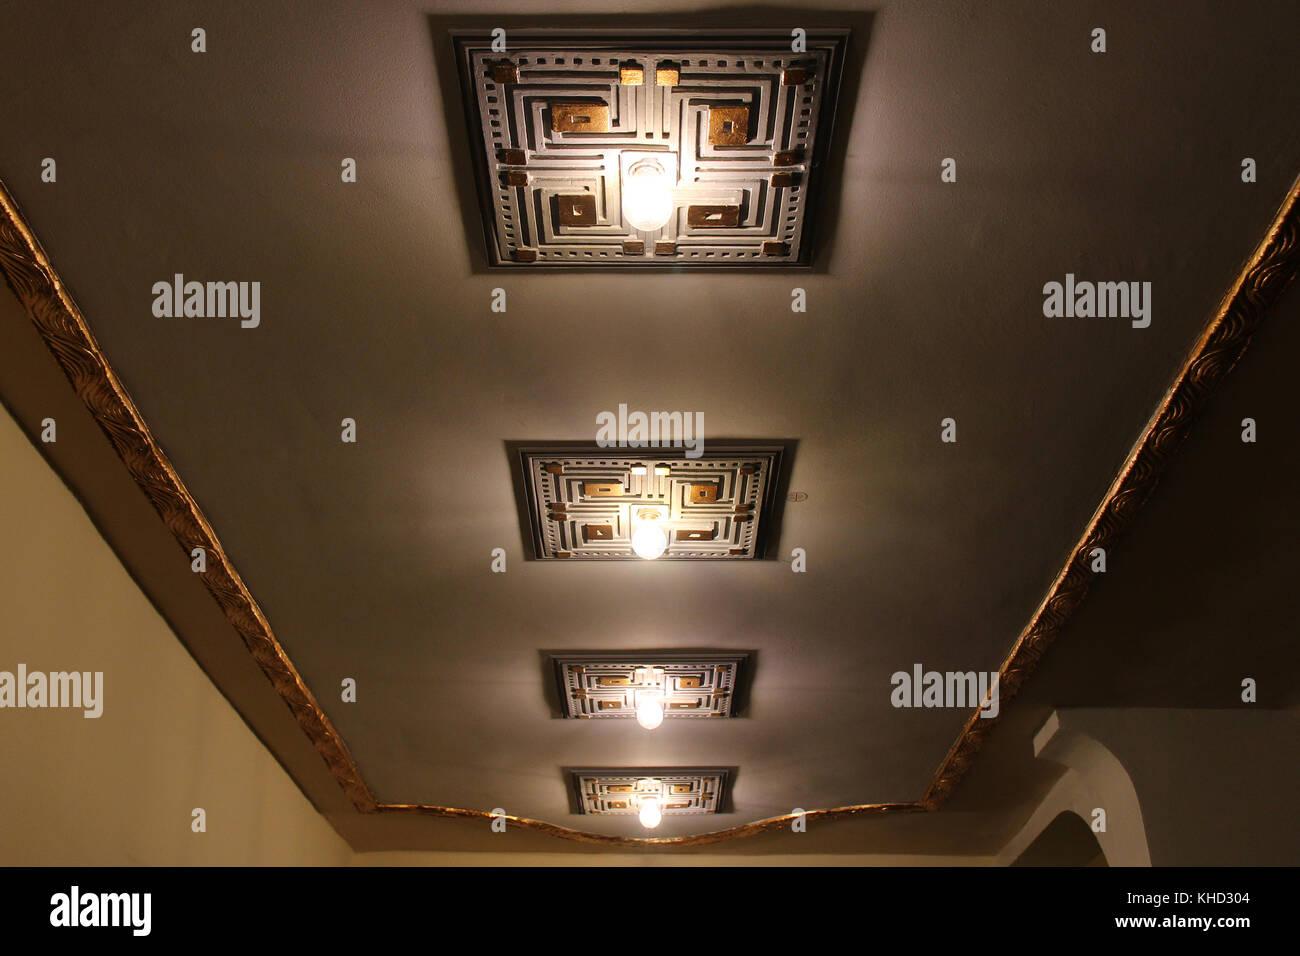 art deco cinema interior stock photos art deco cinema interior stock images alamy. Black Bedroom Furniture Sets. Home Design Ideas